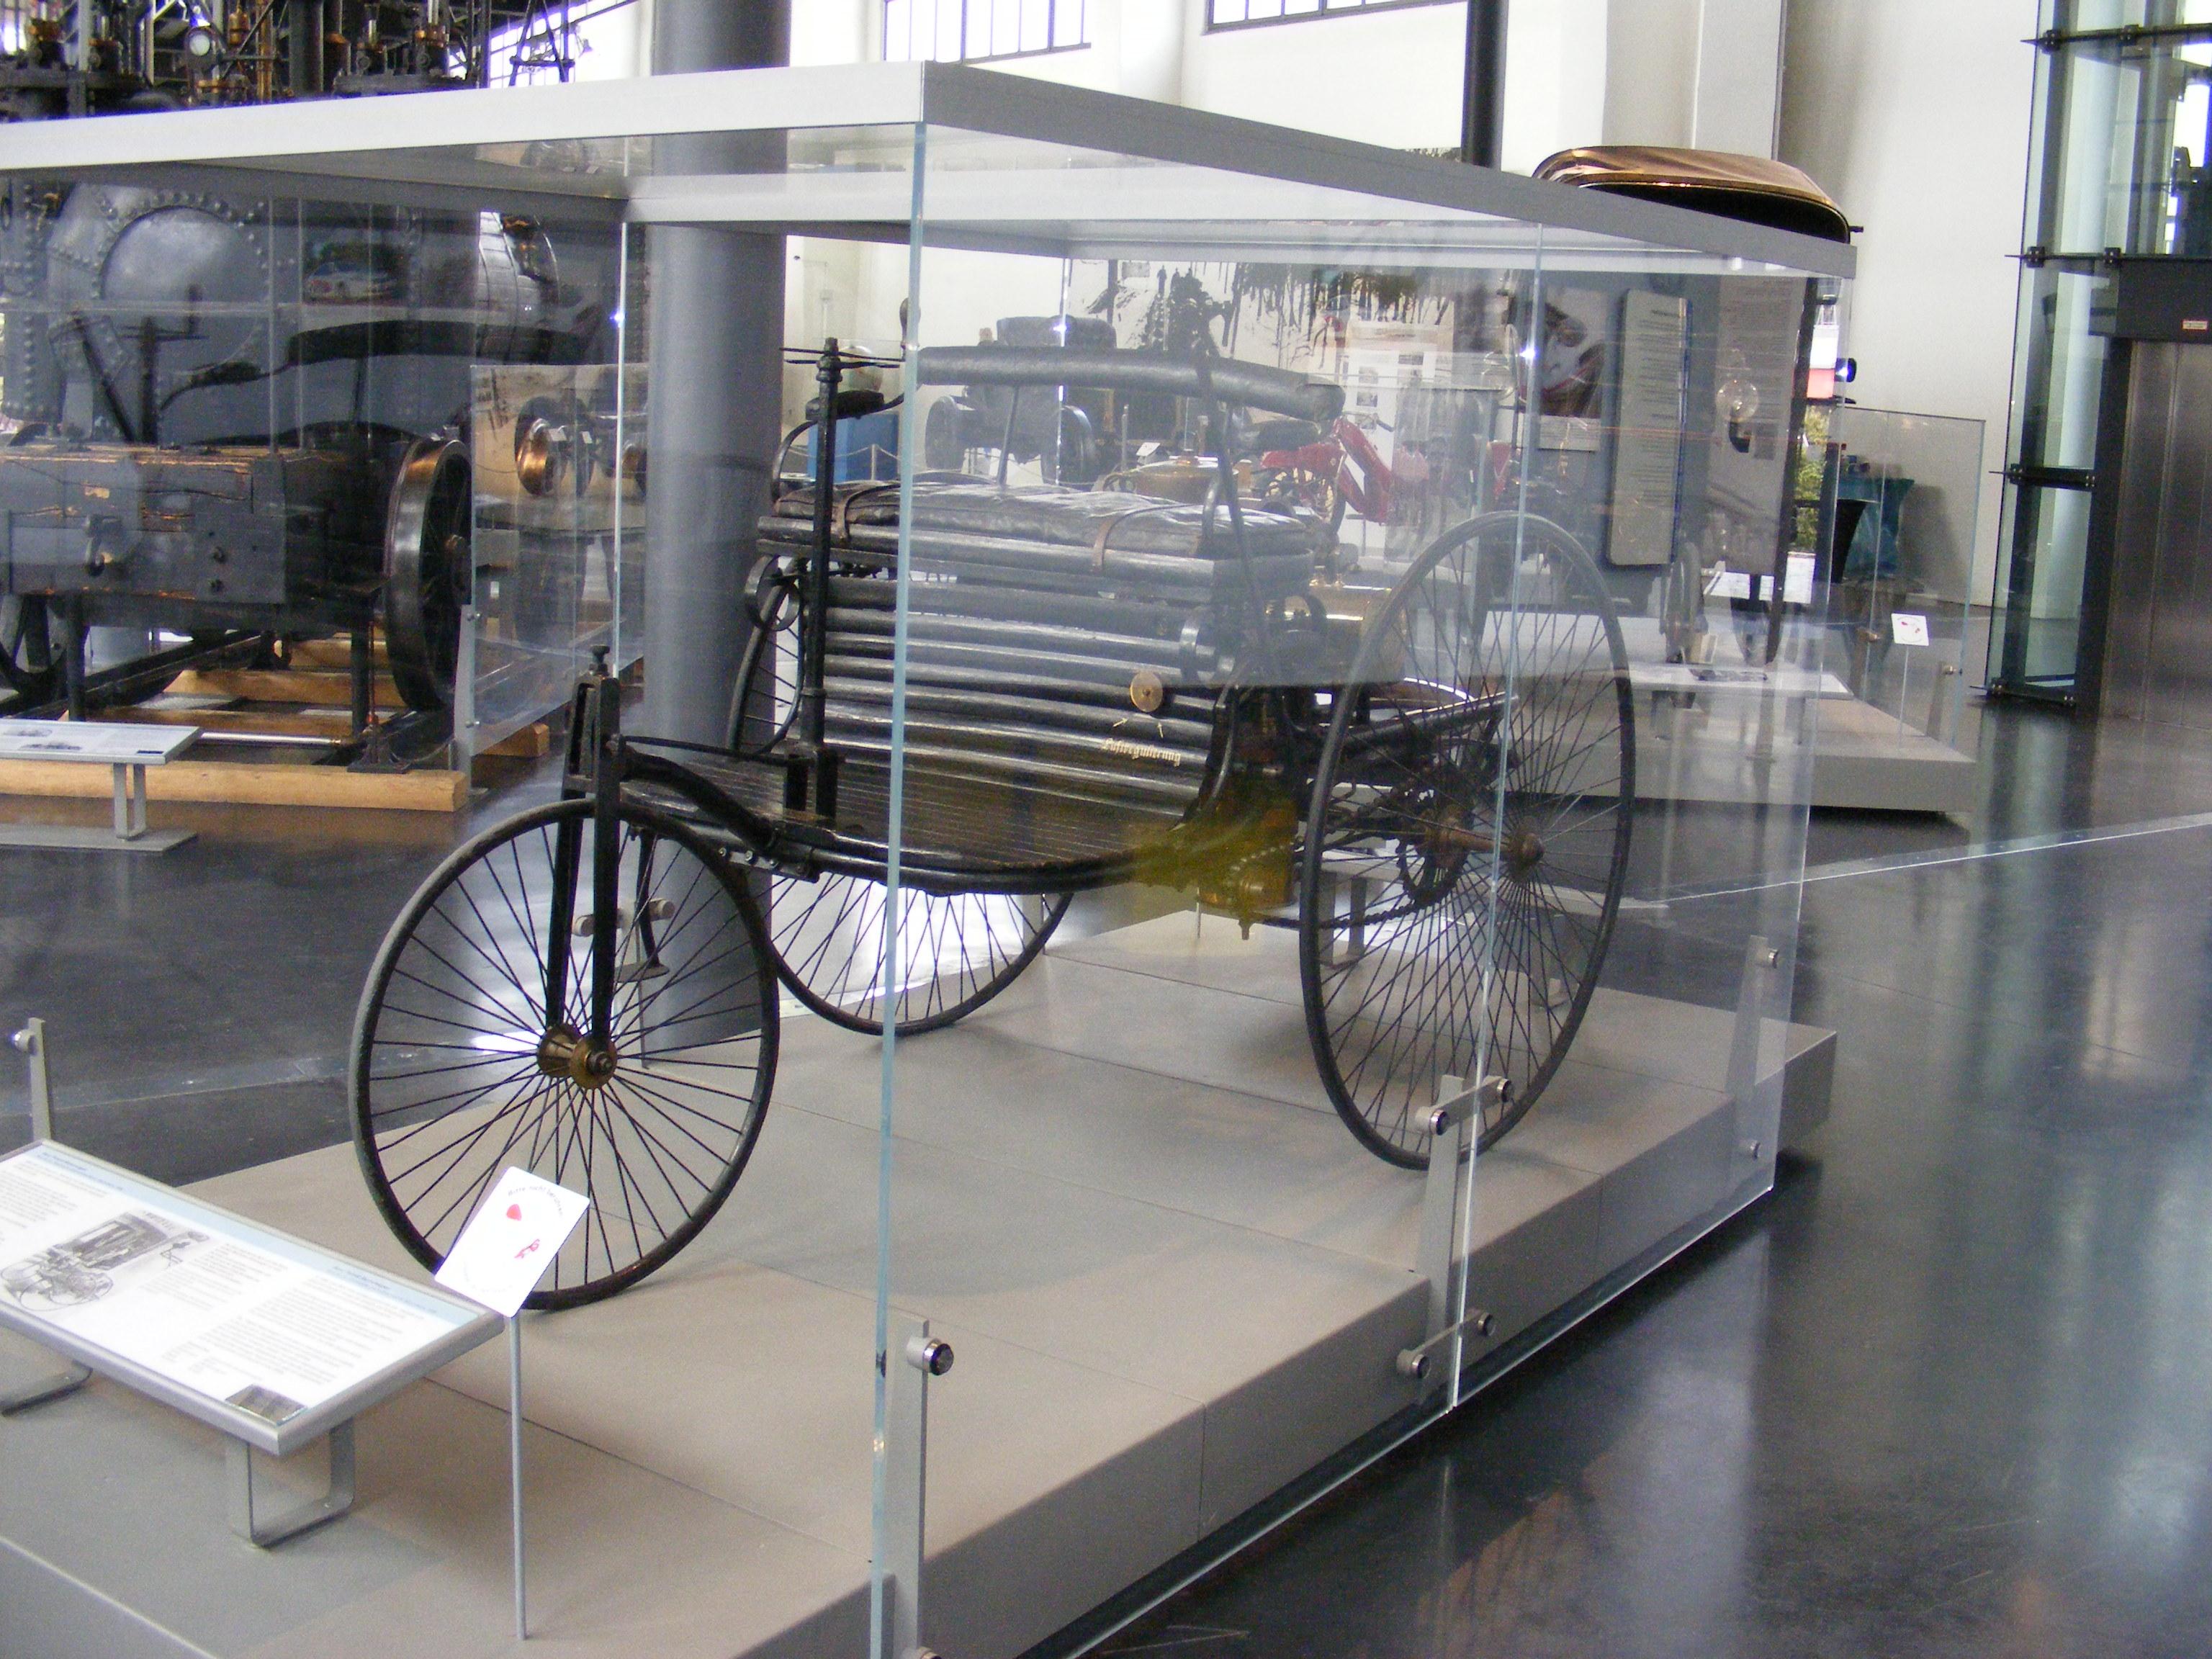 file benz patent motorwagen nummer 1 d m verkehrszentrum jpg wikimedia commons. Black Bedroom Furniture Sets. Home Design Ideas